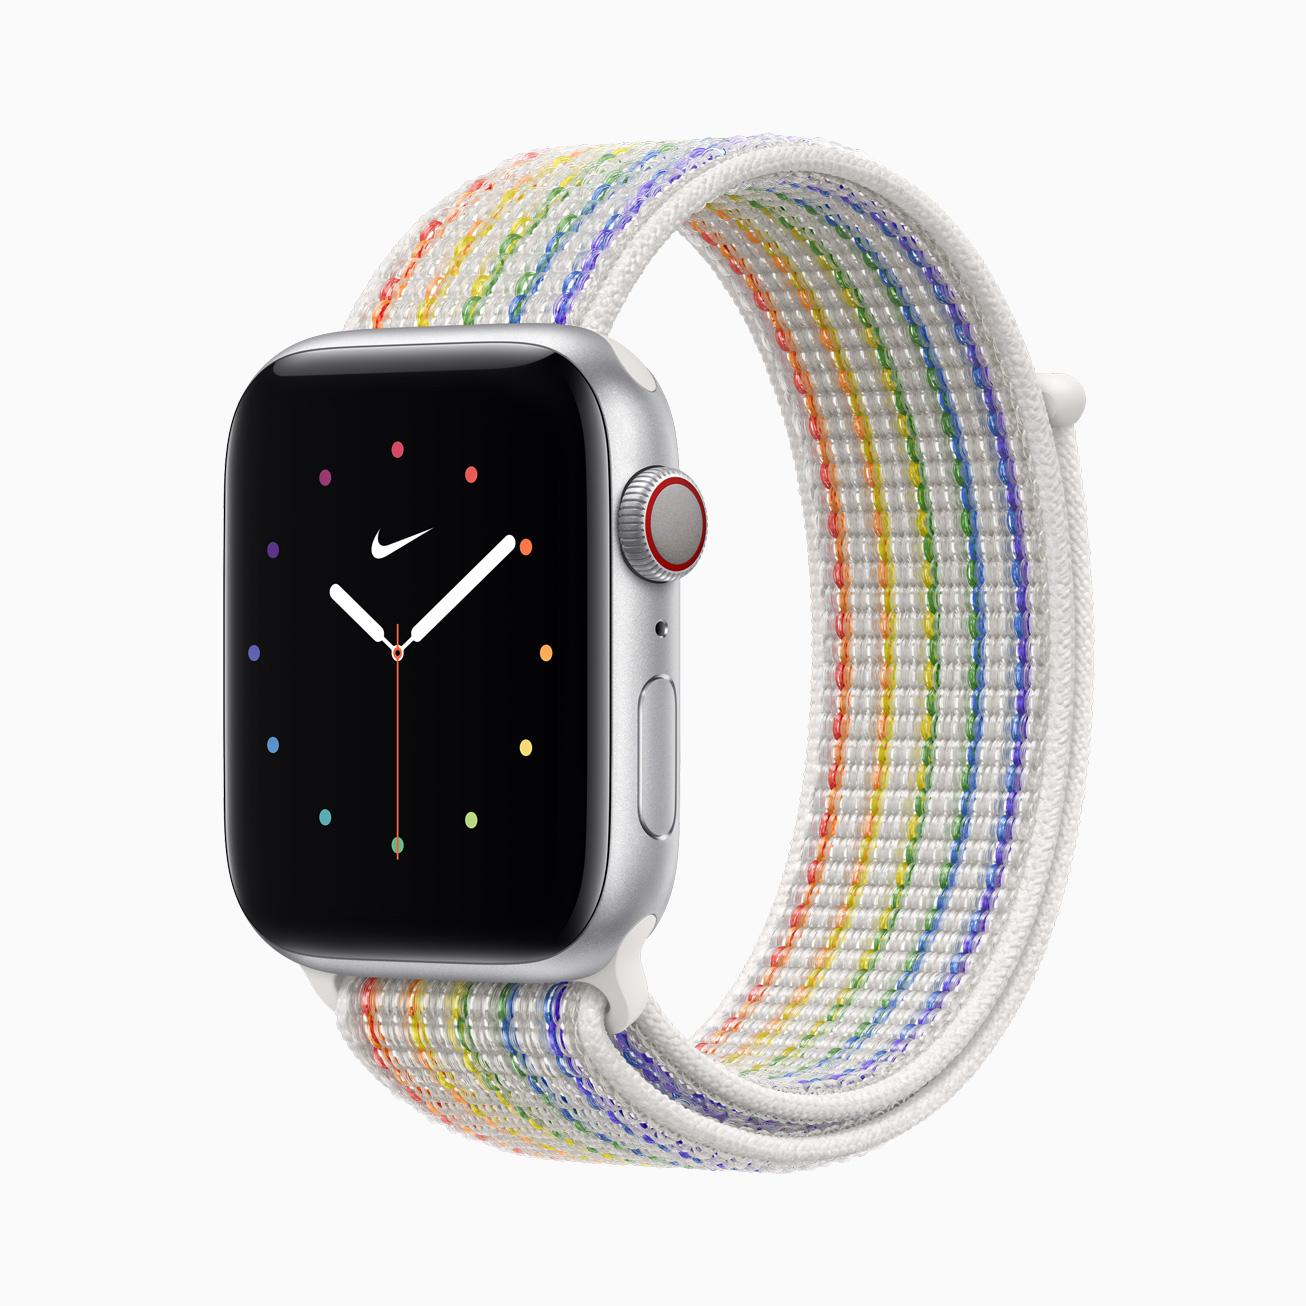 Apple Watch kết hợp với Nike